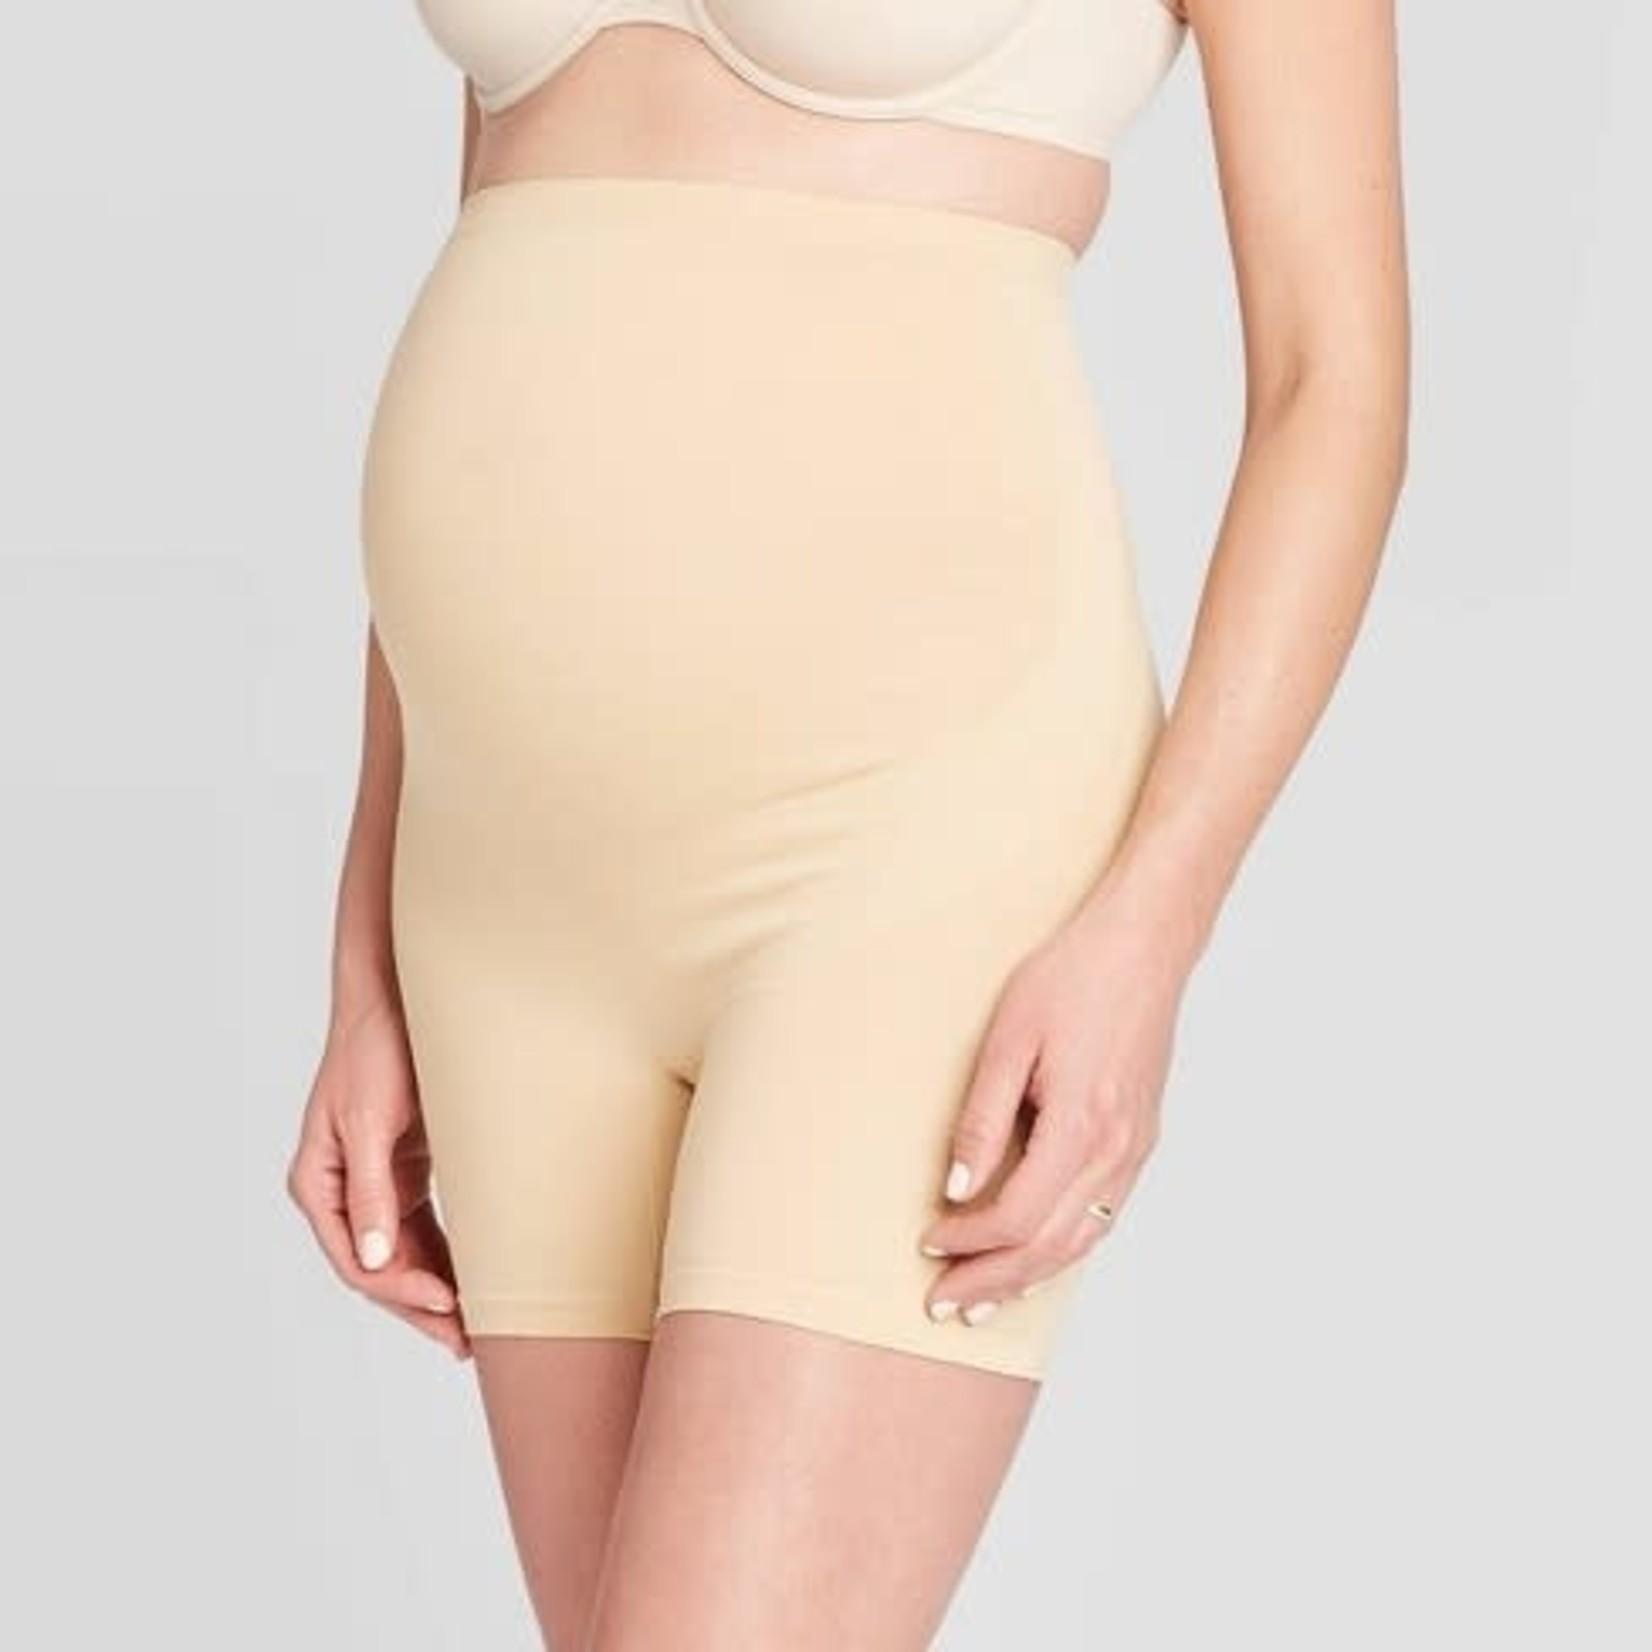 Belly Bandit Basics Maternity Support Shorts - Belly Bandit -M